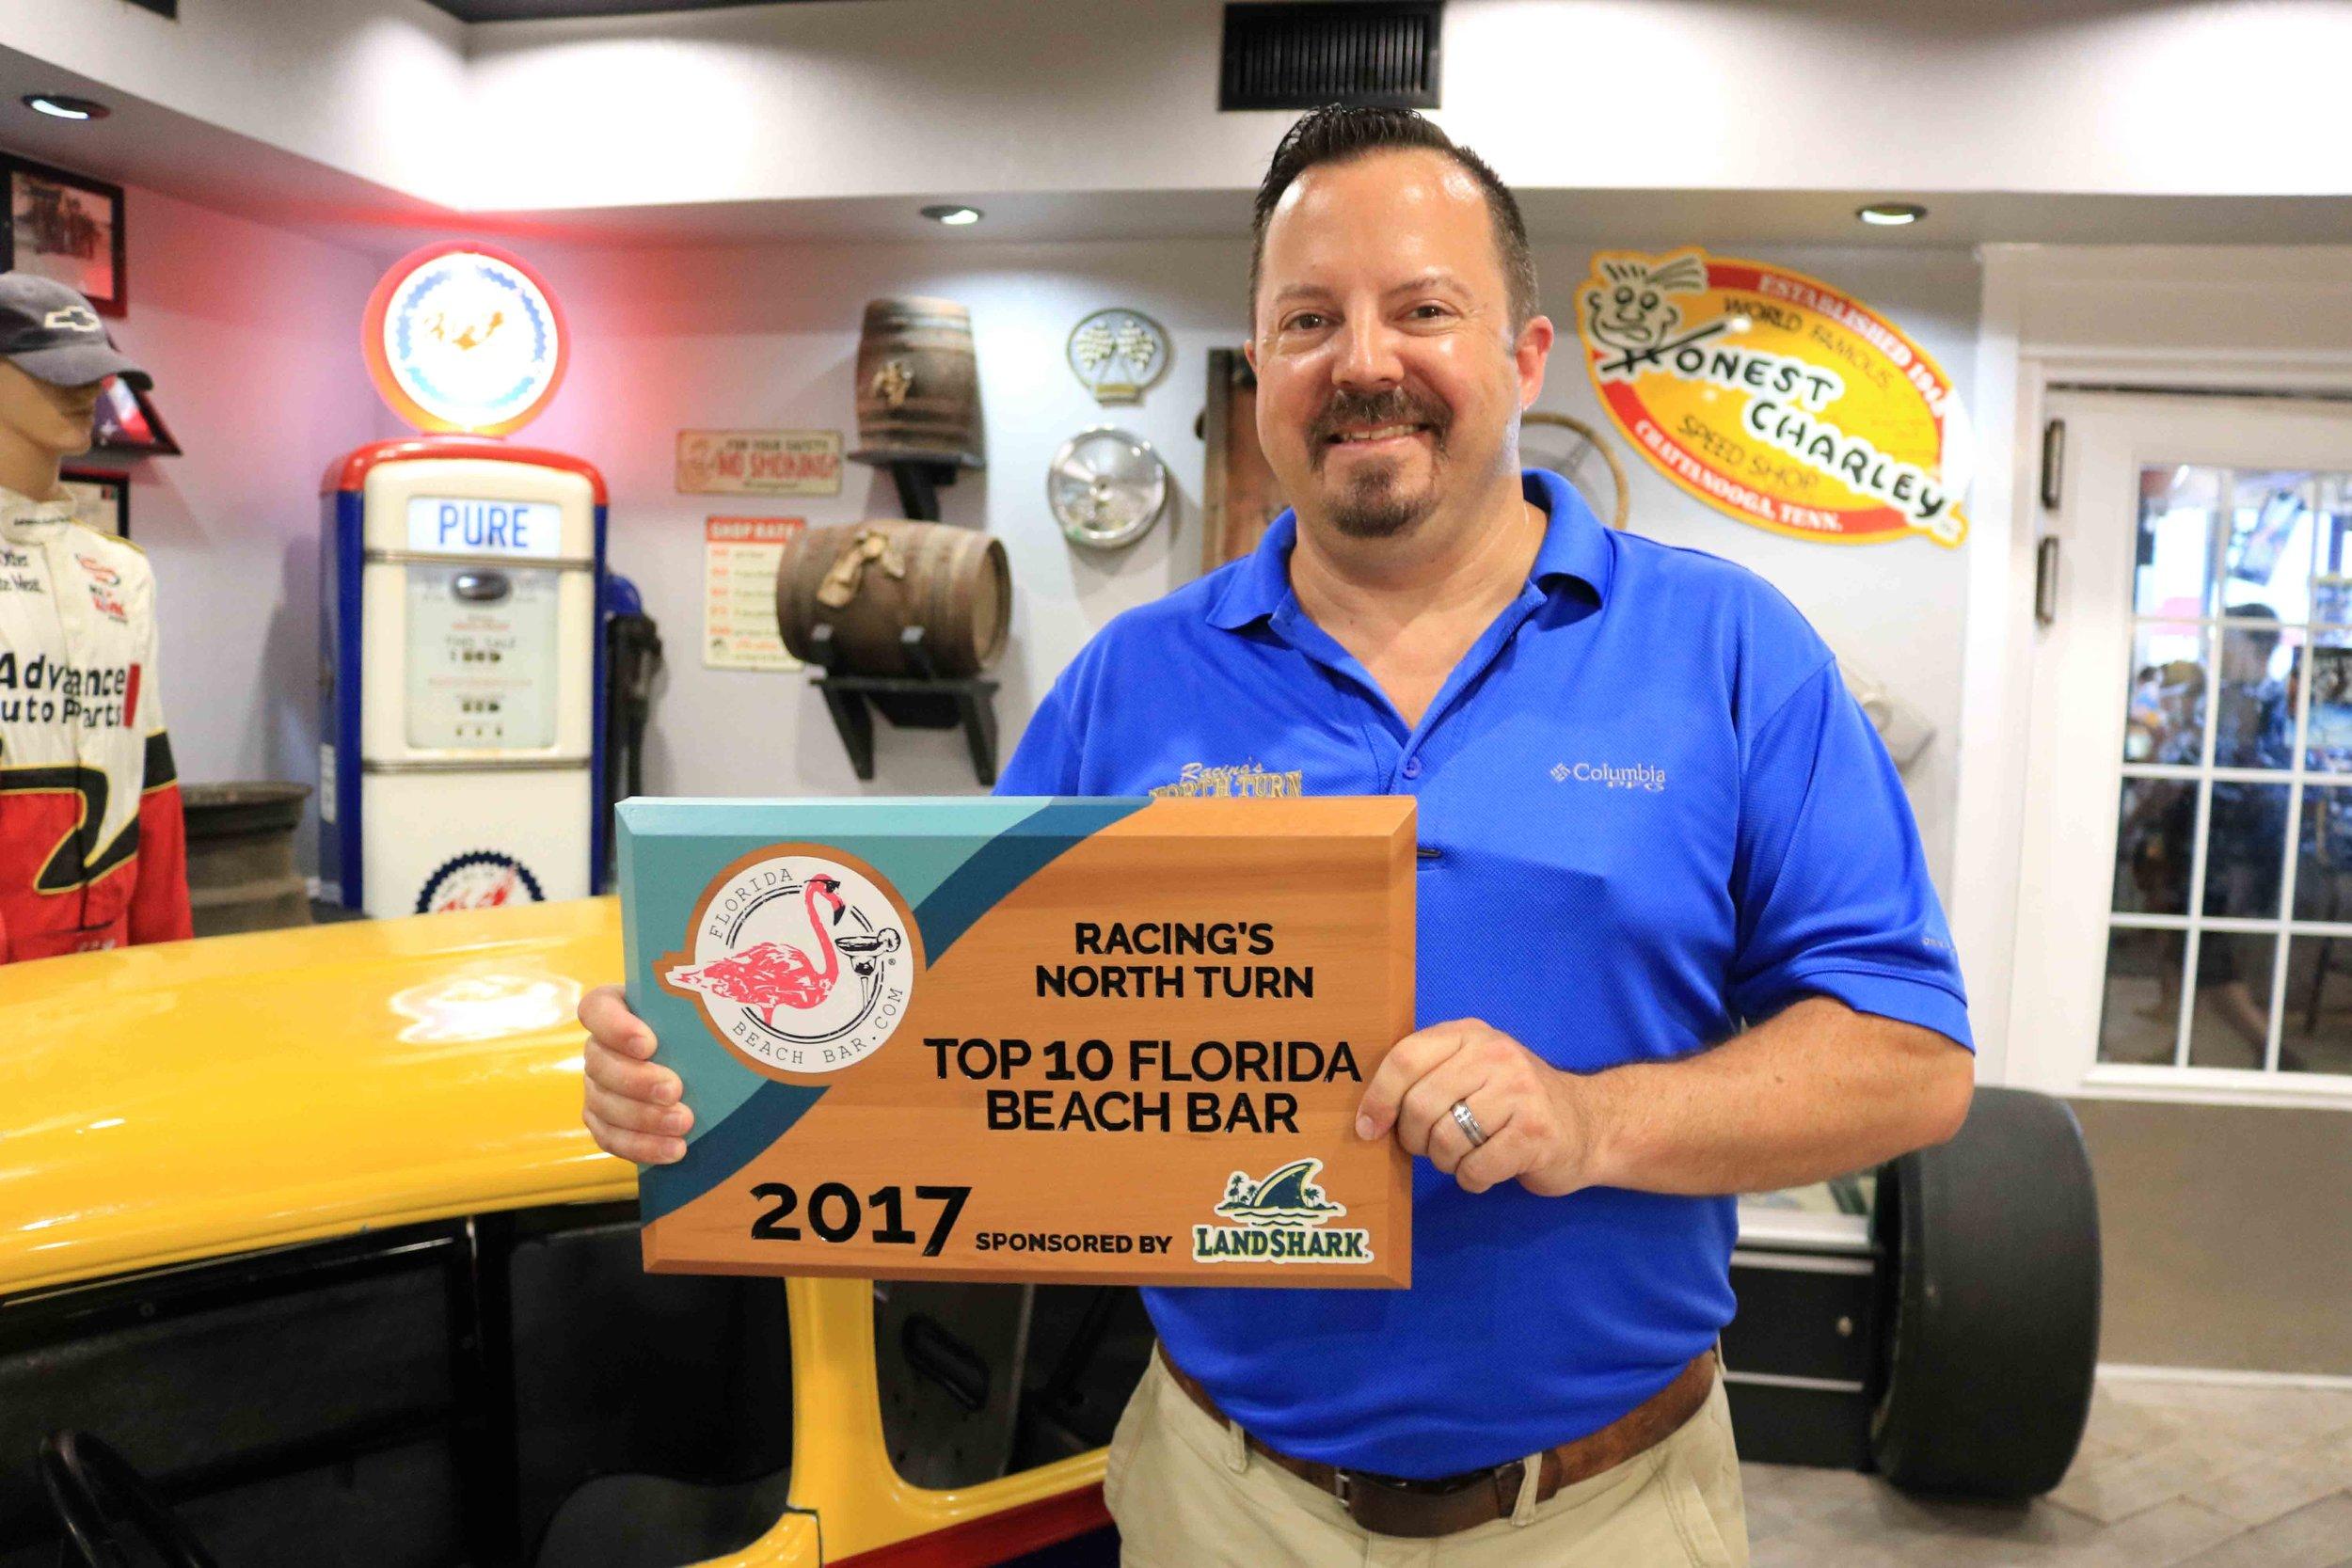 Racing's North Turn General manager, Lars Bienemann, Receives the Top 10 Florida Beach Bar Award